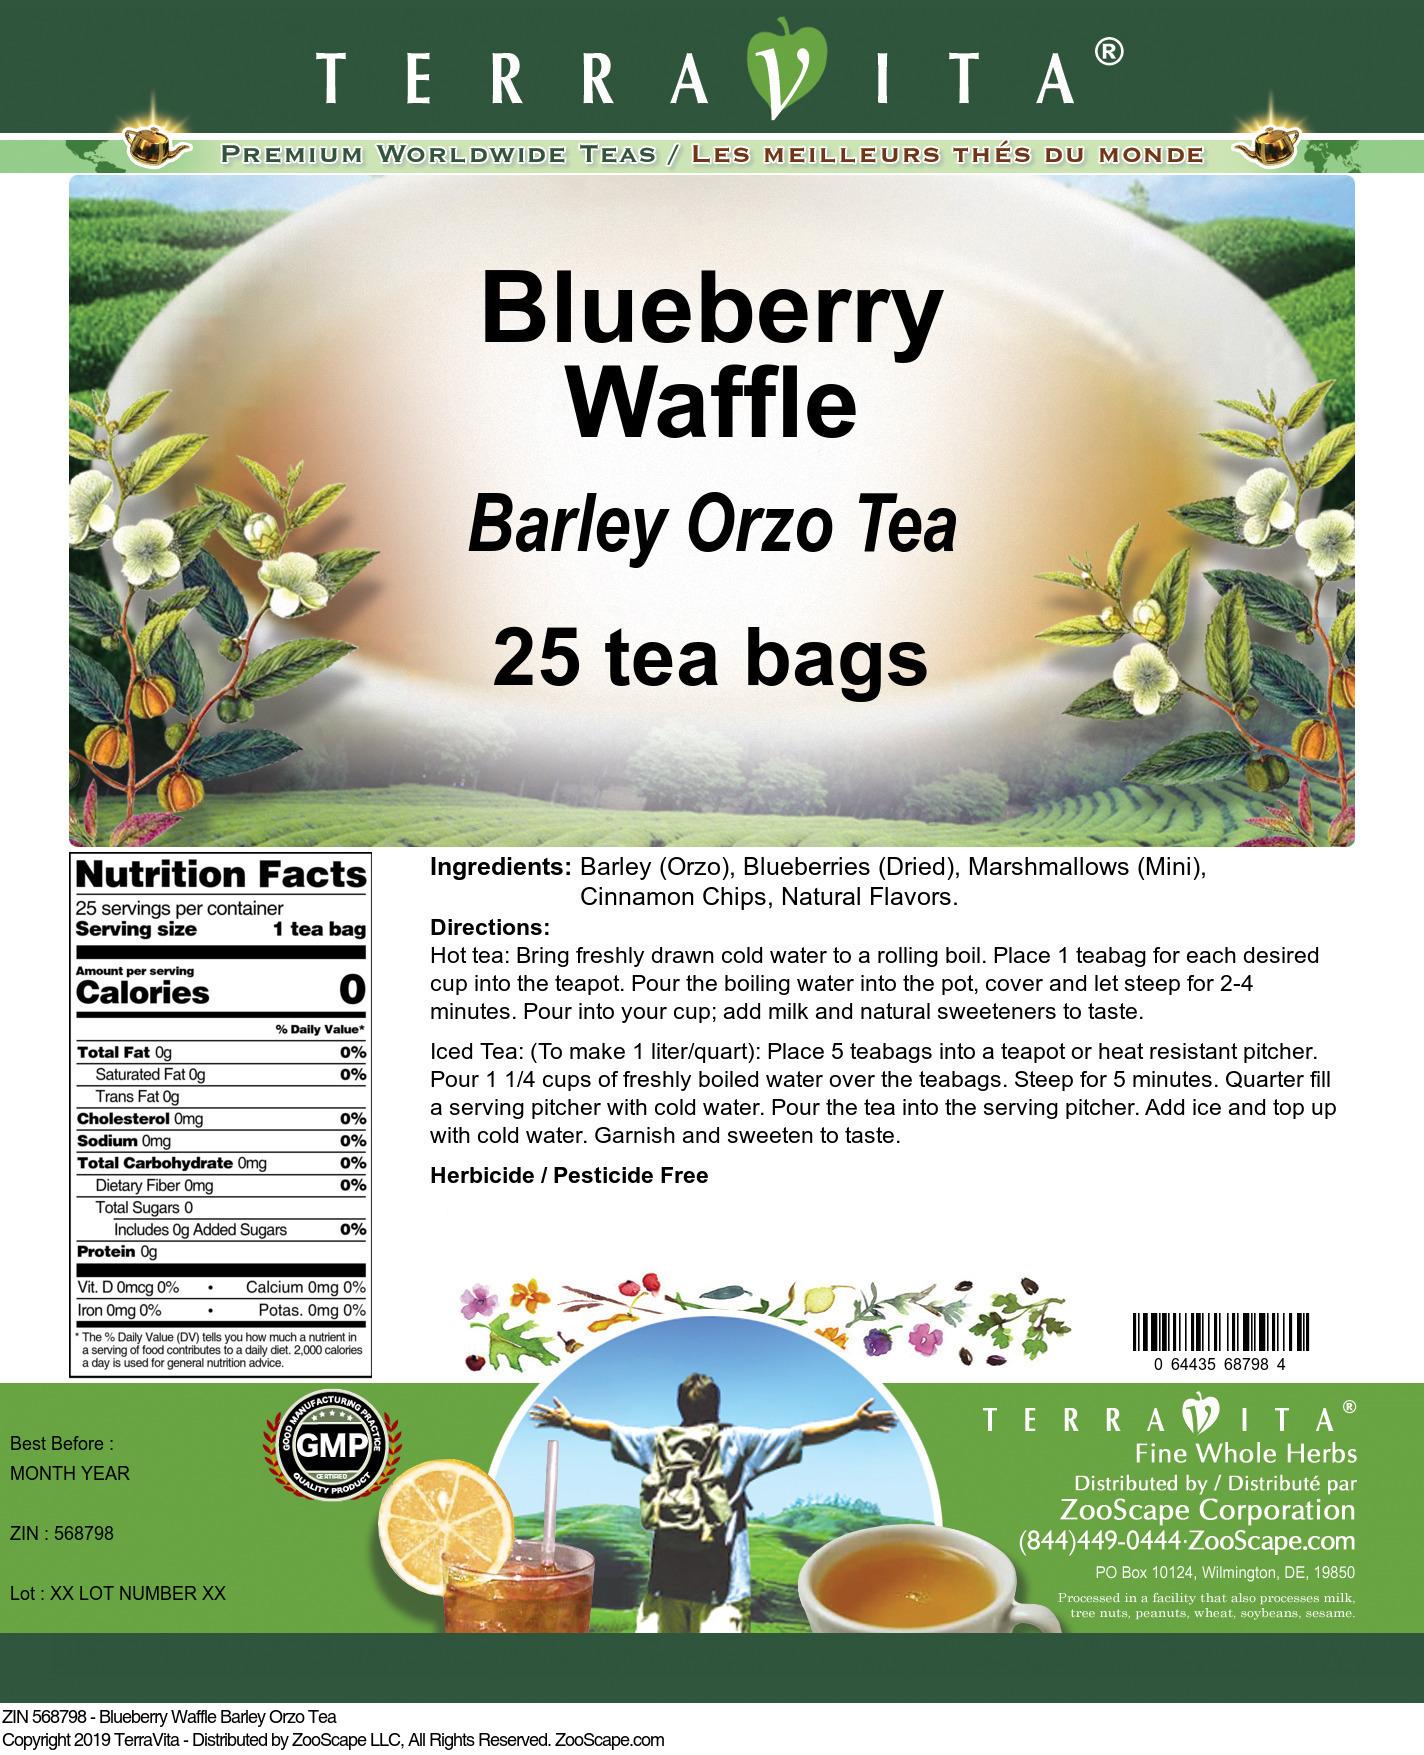 Blueberry Waffle Barley Orzo Tea